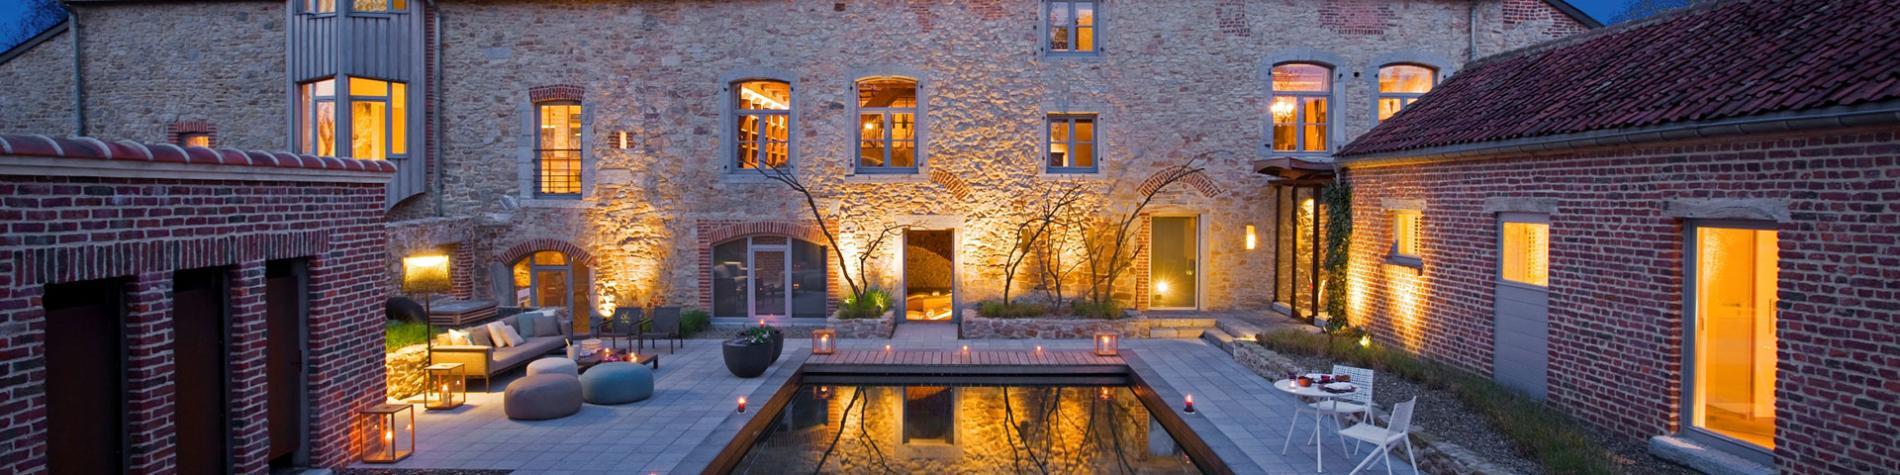 NE5T - Hôtel - Spa - Namur